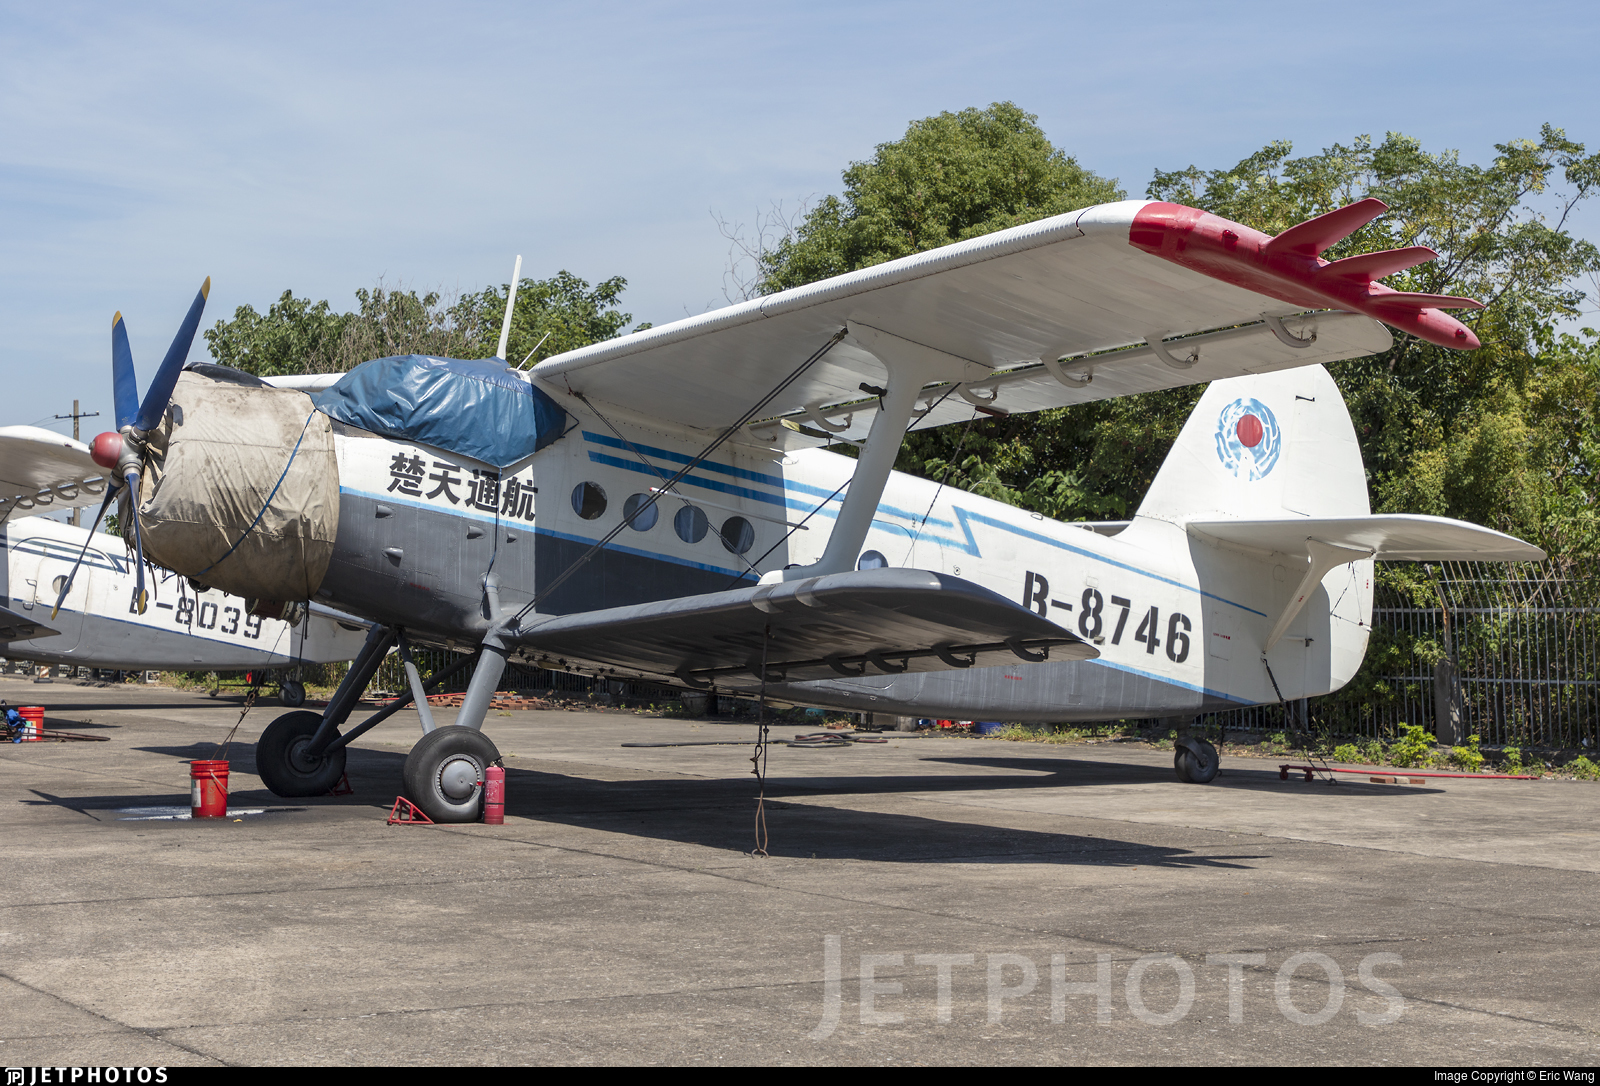 B-8746 - Nanchang Y-5 - Chutian General Airlines